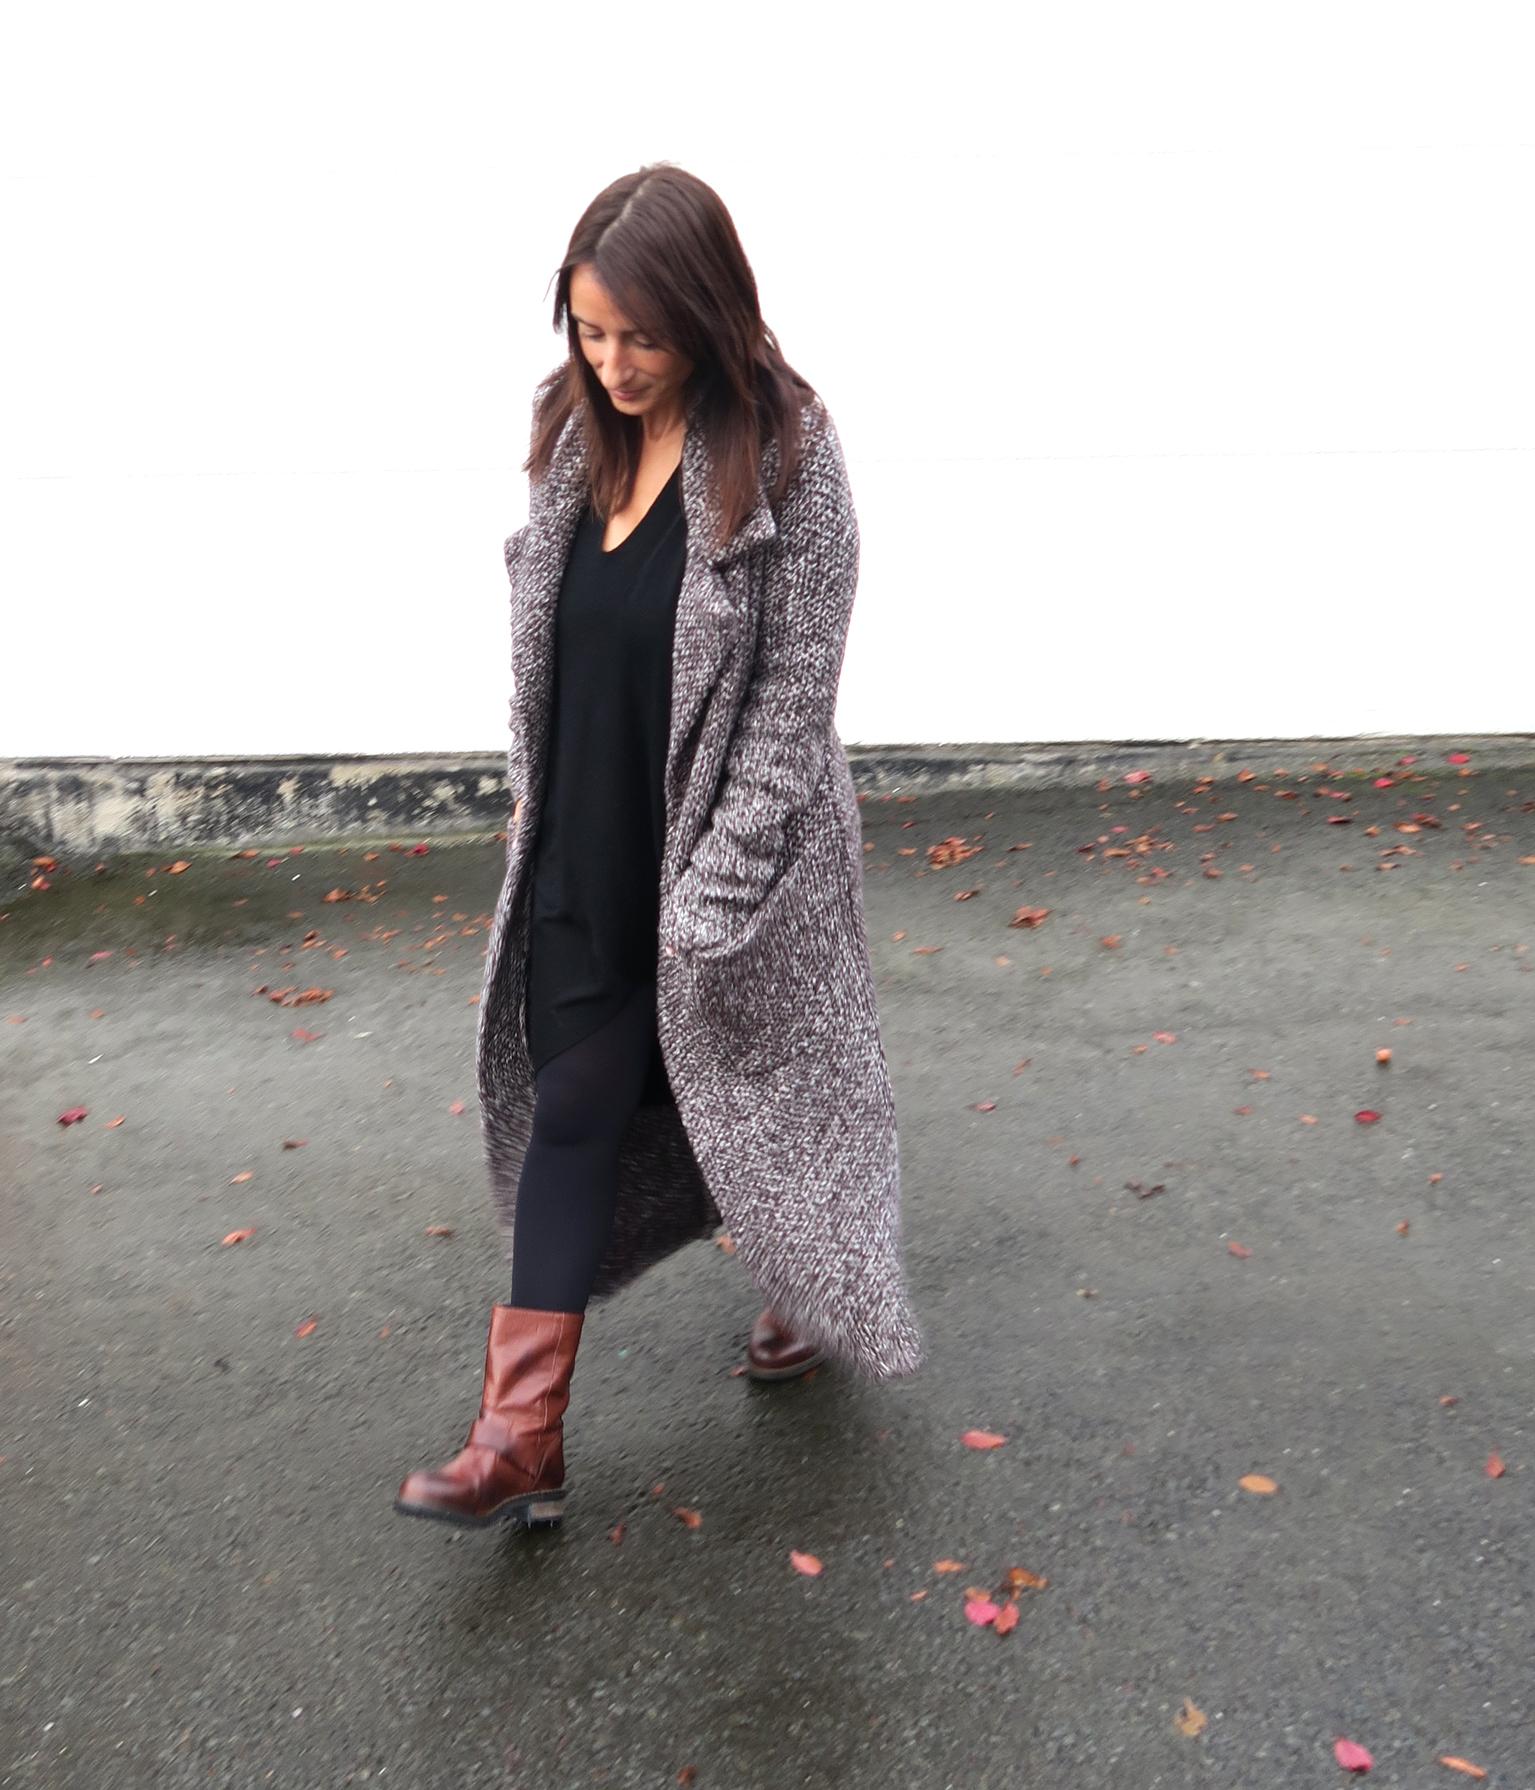 modesalat-blogger-fashionstyle-brands4friends-buffalo-boots-3